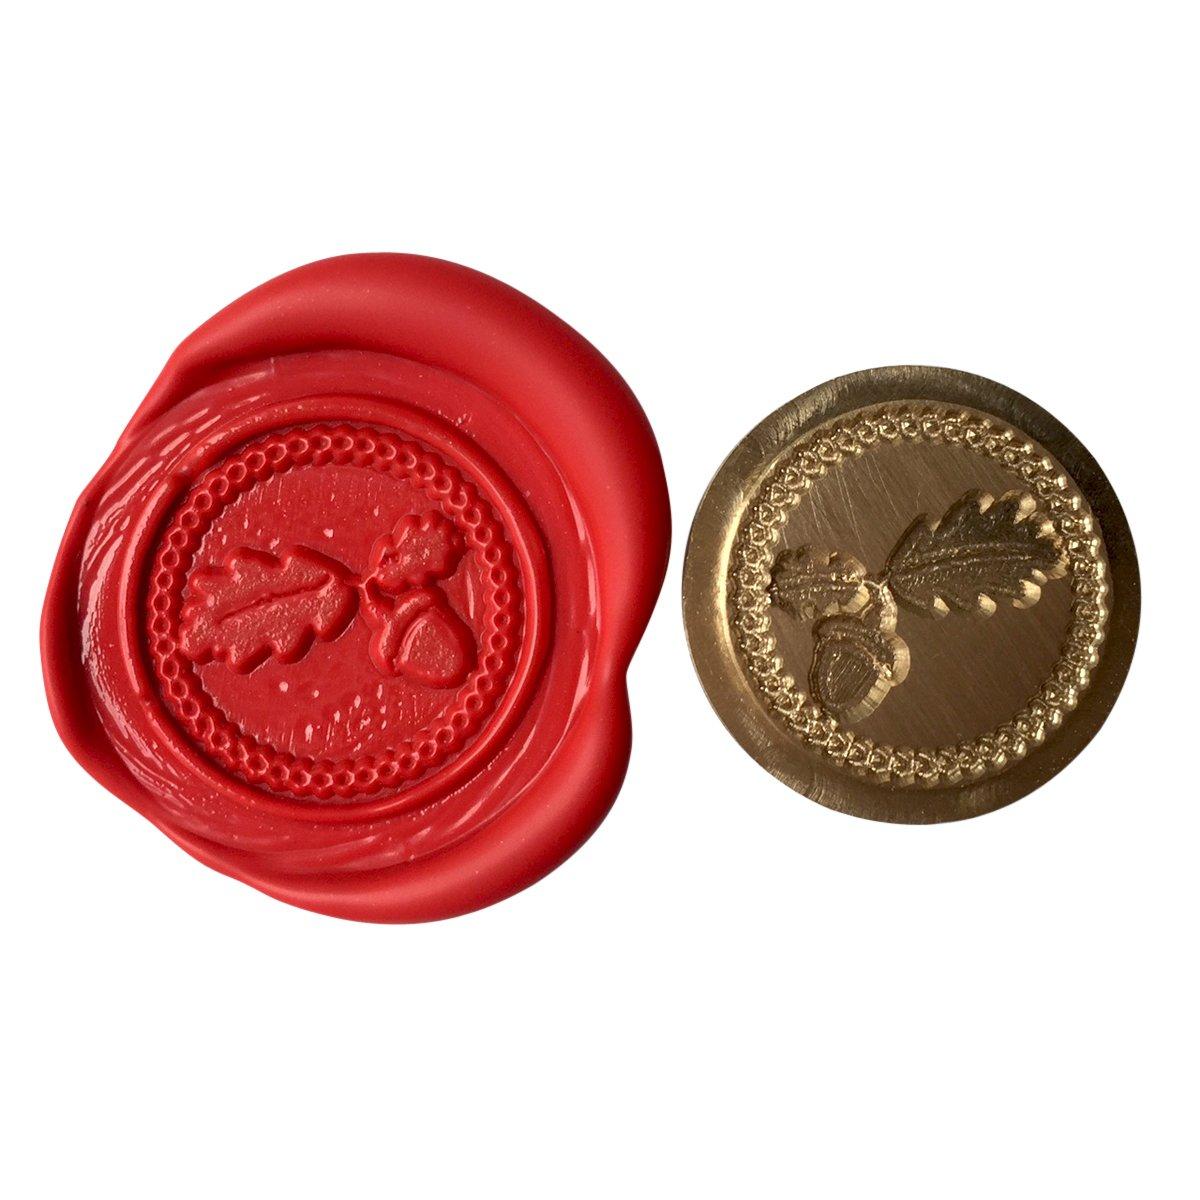 A Single OAK LEAVES & ACORN Coin Seal XWSC026 (S30) GTR-Gifts